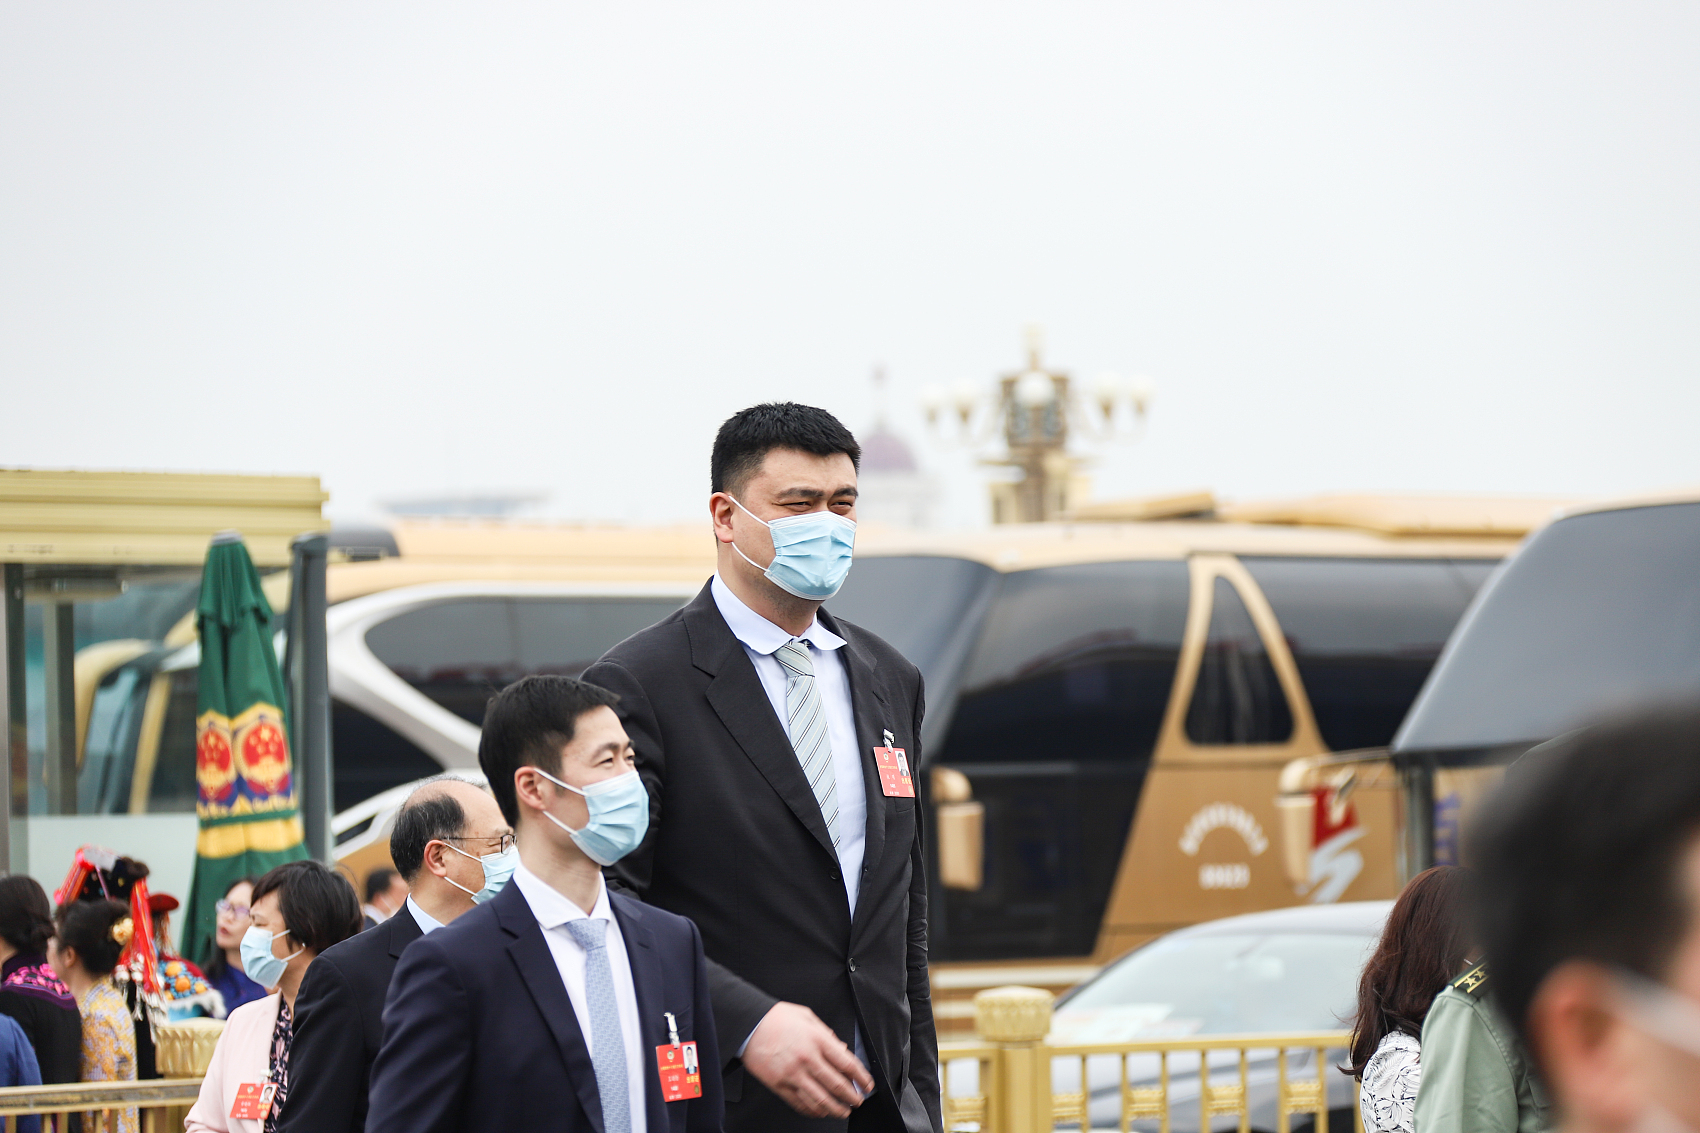 Yao Ming on CBA restart: 'Everything is just beginning'